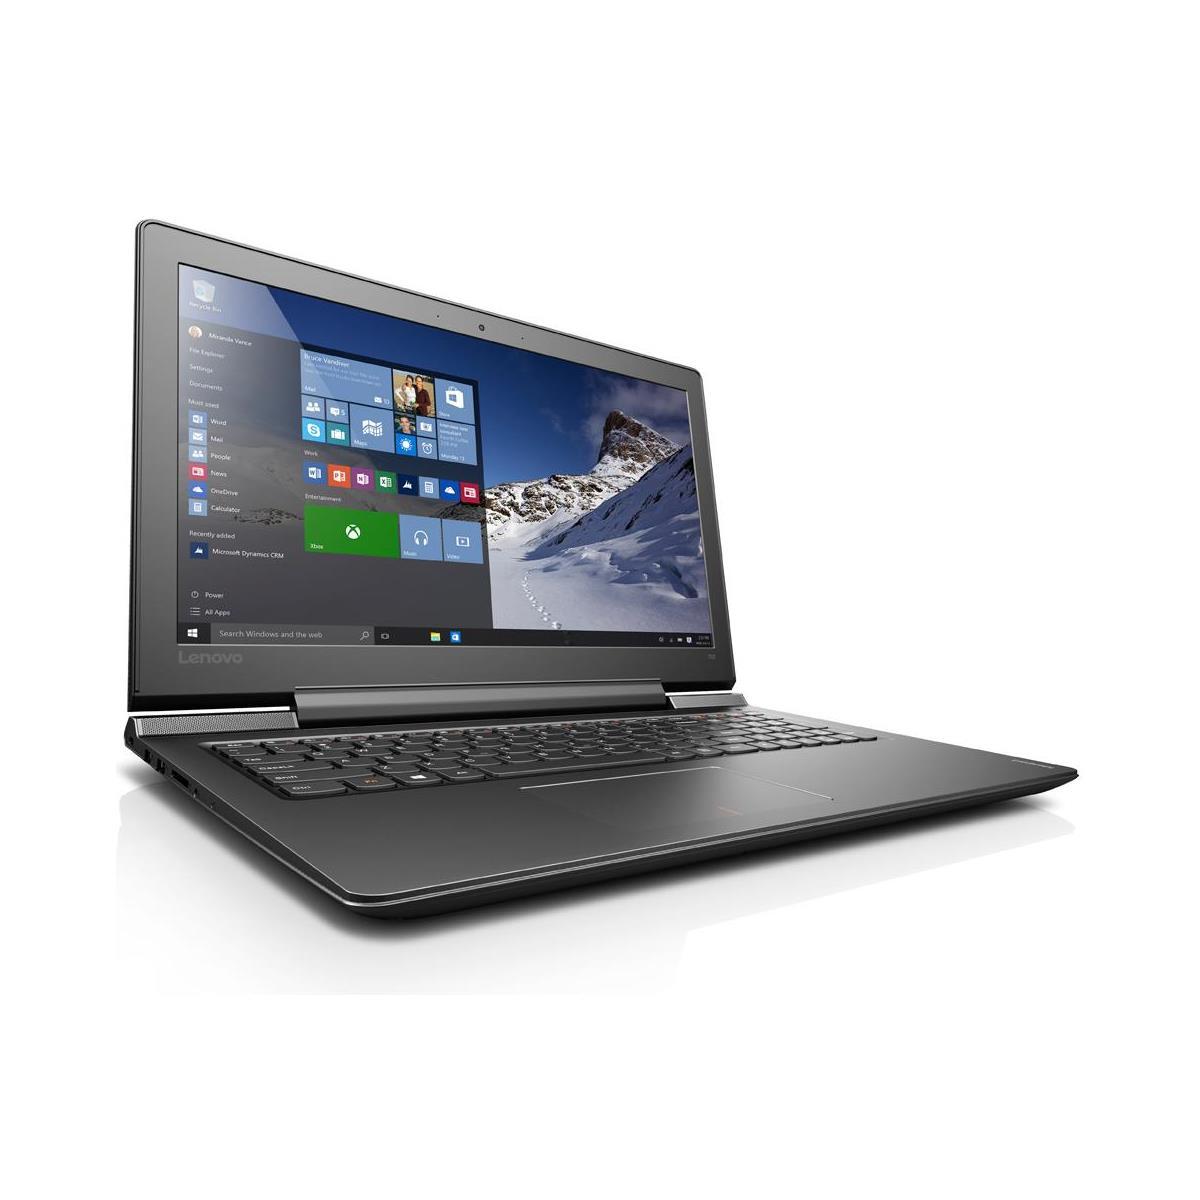 "Lenovo IdeaPad 700 15.6"" Laptop: i7-6700, 16GB DDR4, 256GB SSD + 1TB HDD, 950M  $800 + Free Shipping"